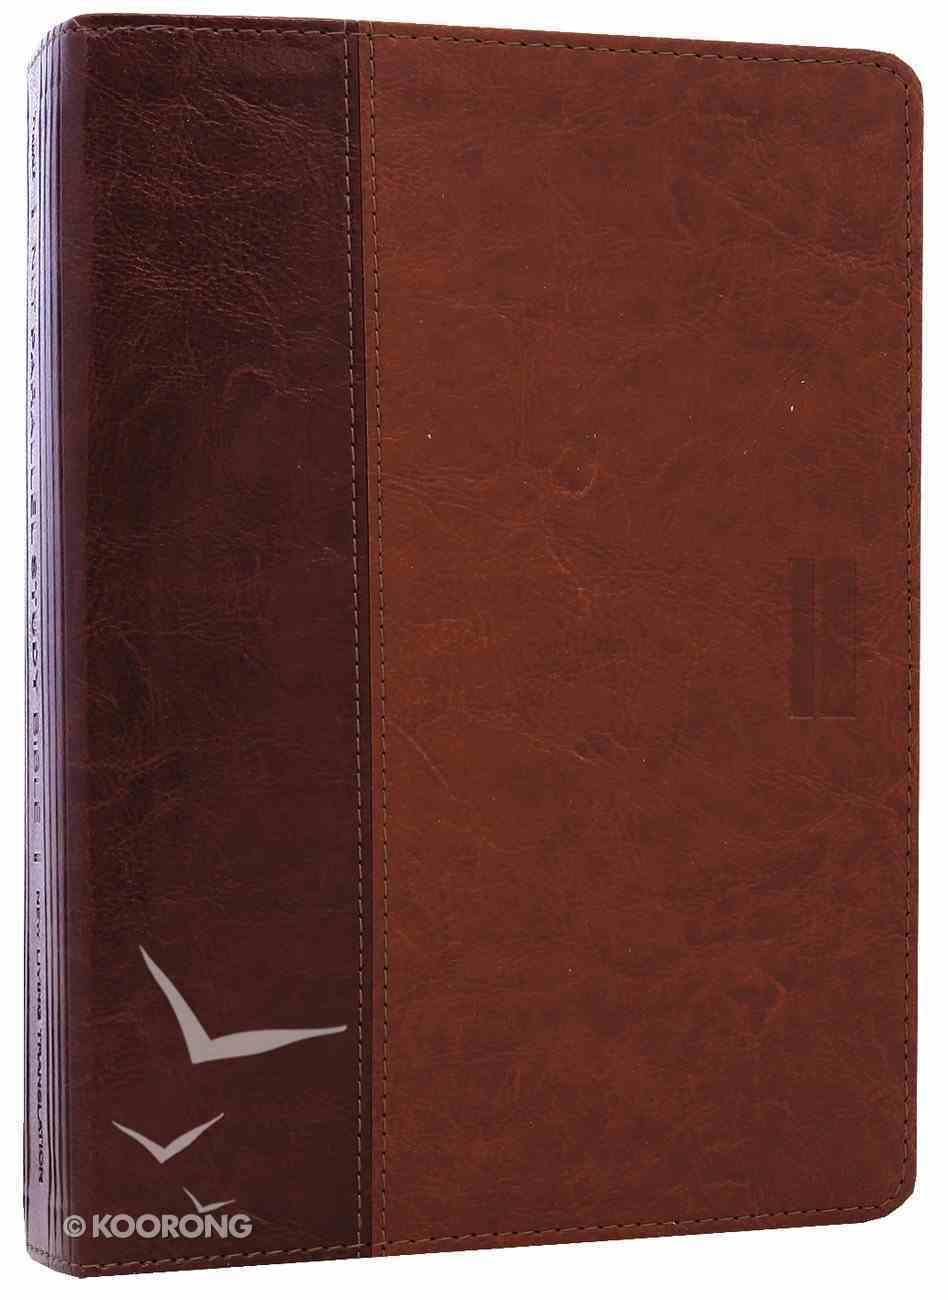 NLT Parallel Study Bible Brown/Tan (Black Letter Edition) Imitation Leather